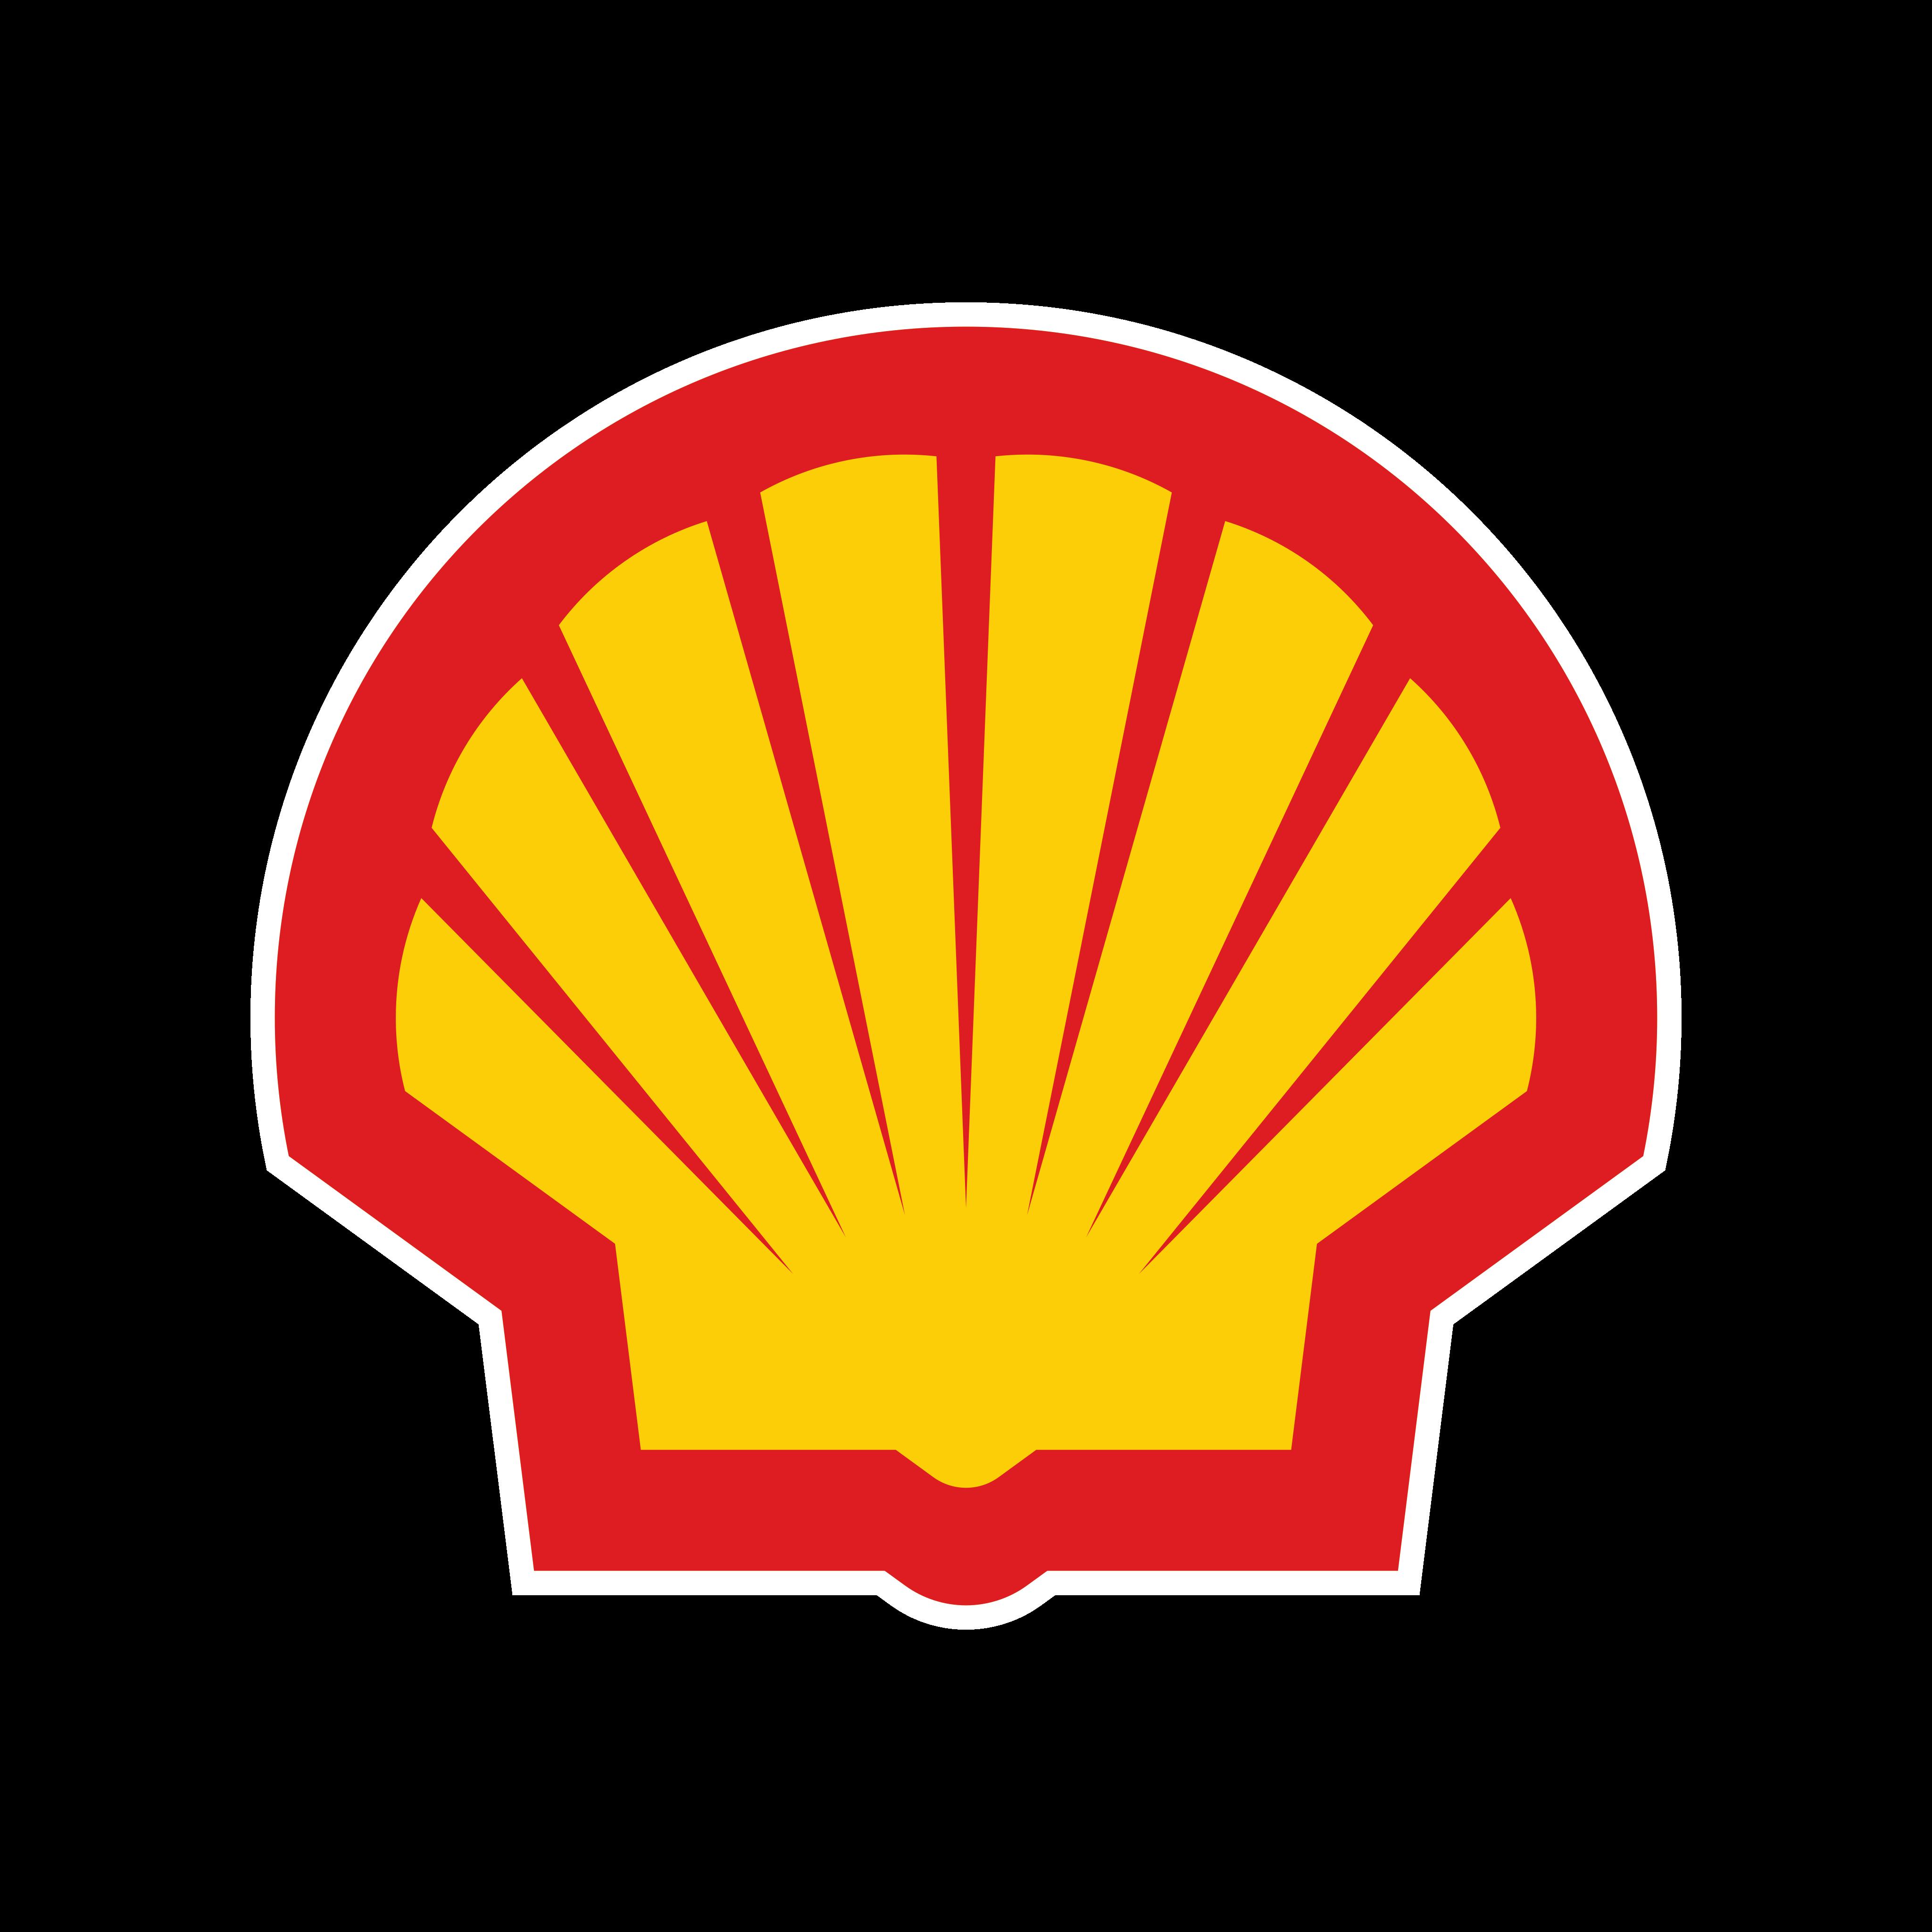 shell logo 0 - Shell Logo